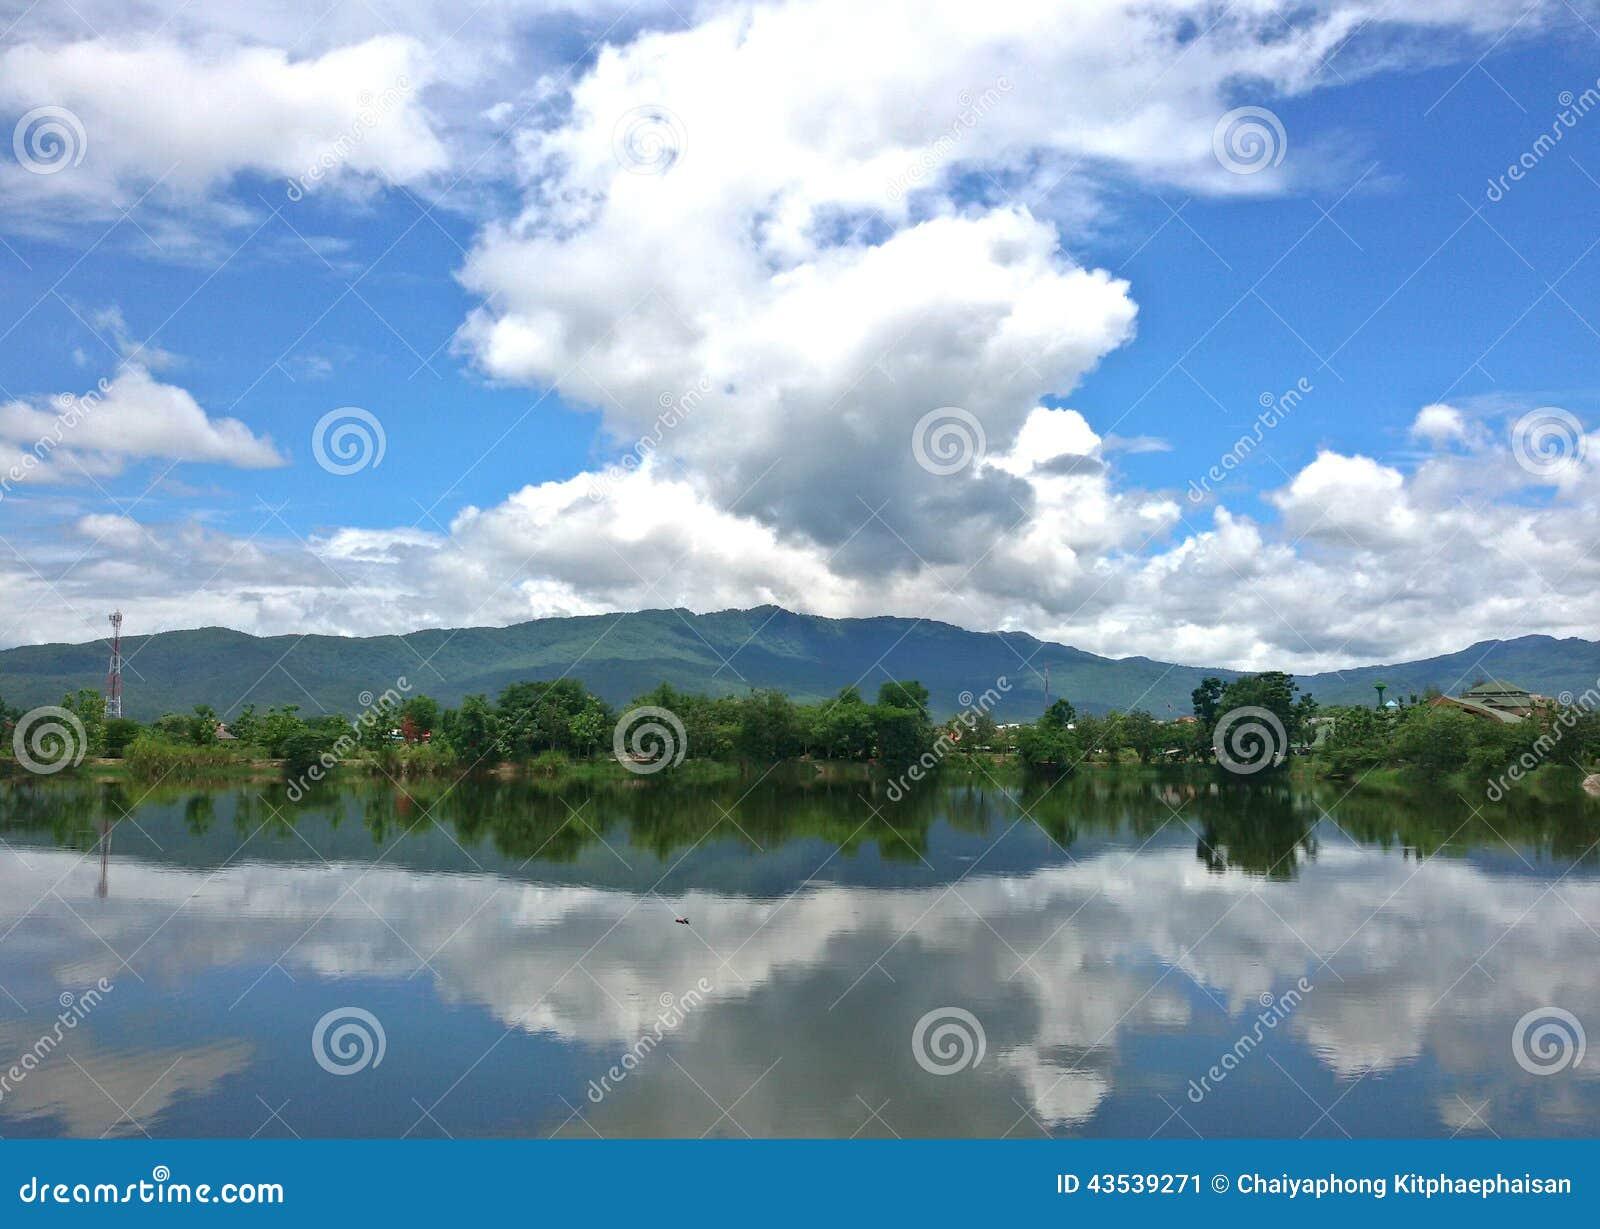 sky blue mountain reflection - photo #12